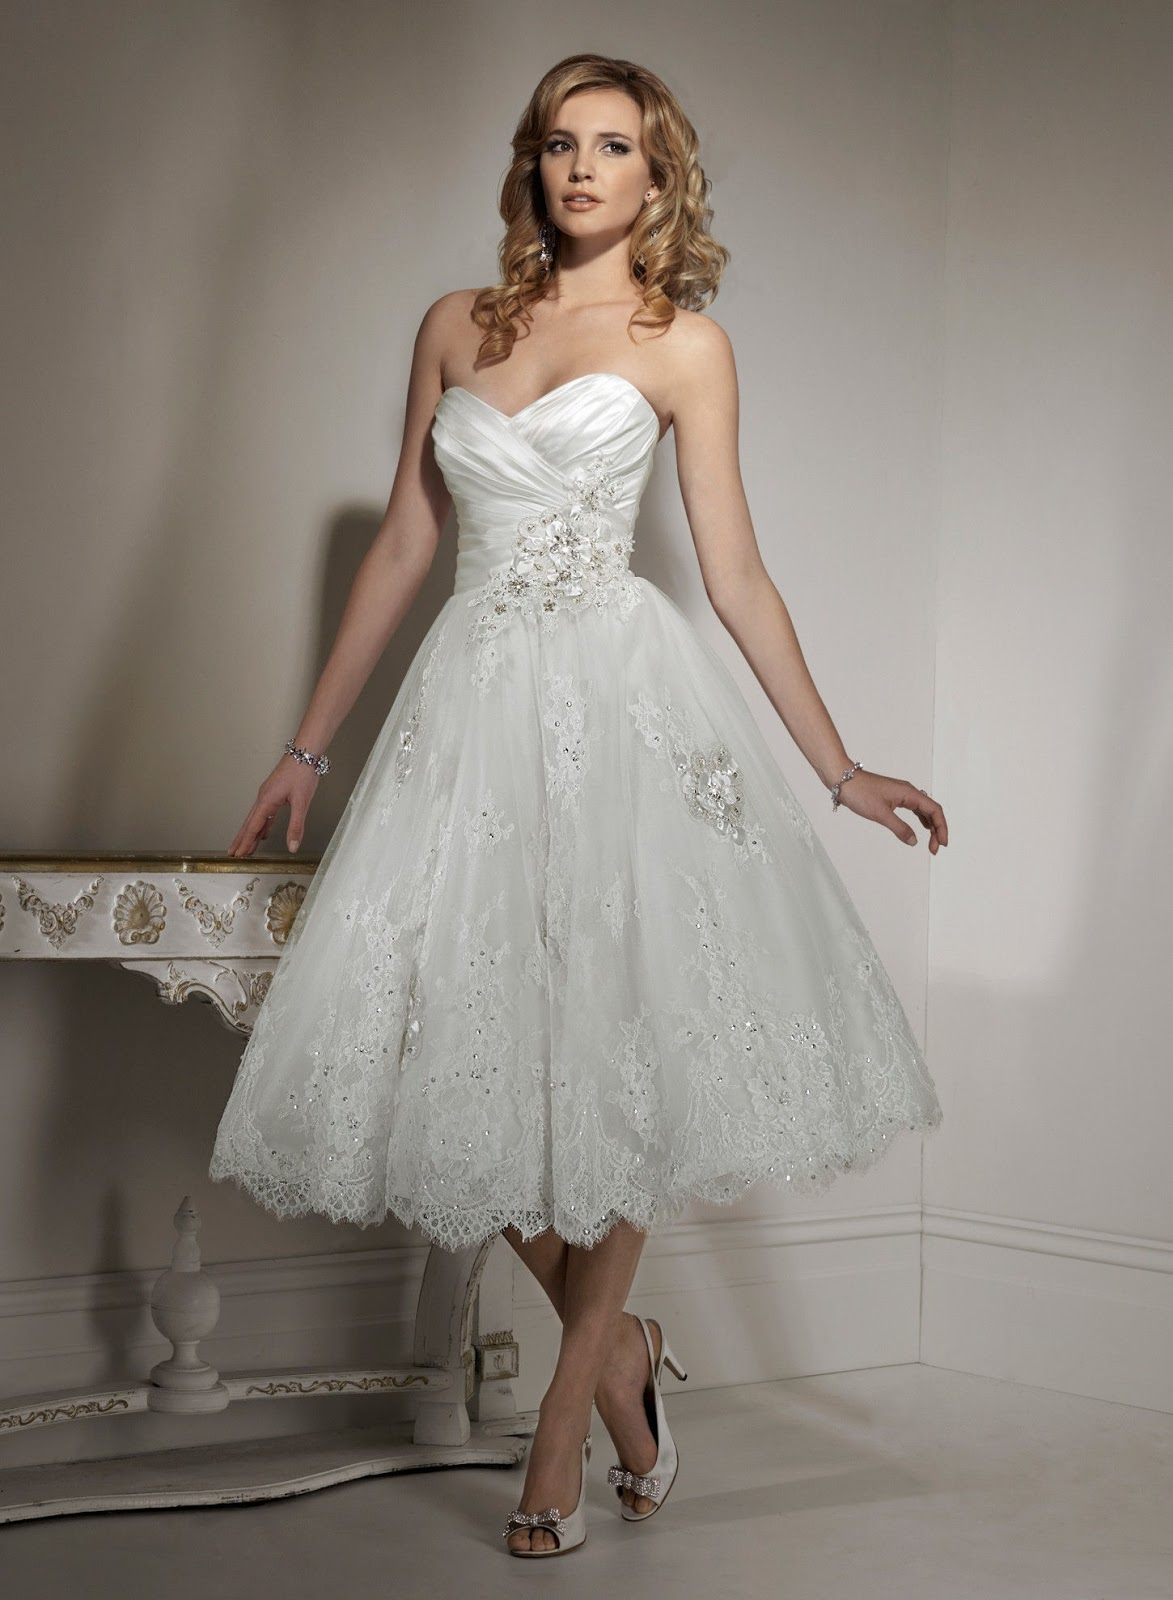 wedding dresses for petite brides petite wedding dress wedding gowns for petite brides dillards petite dresses petite formal dresses petite dresses